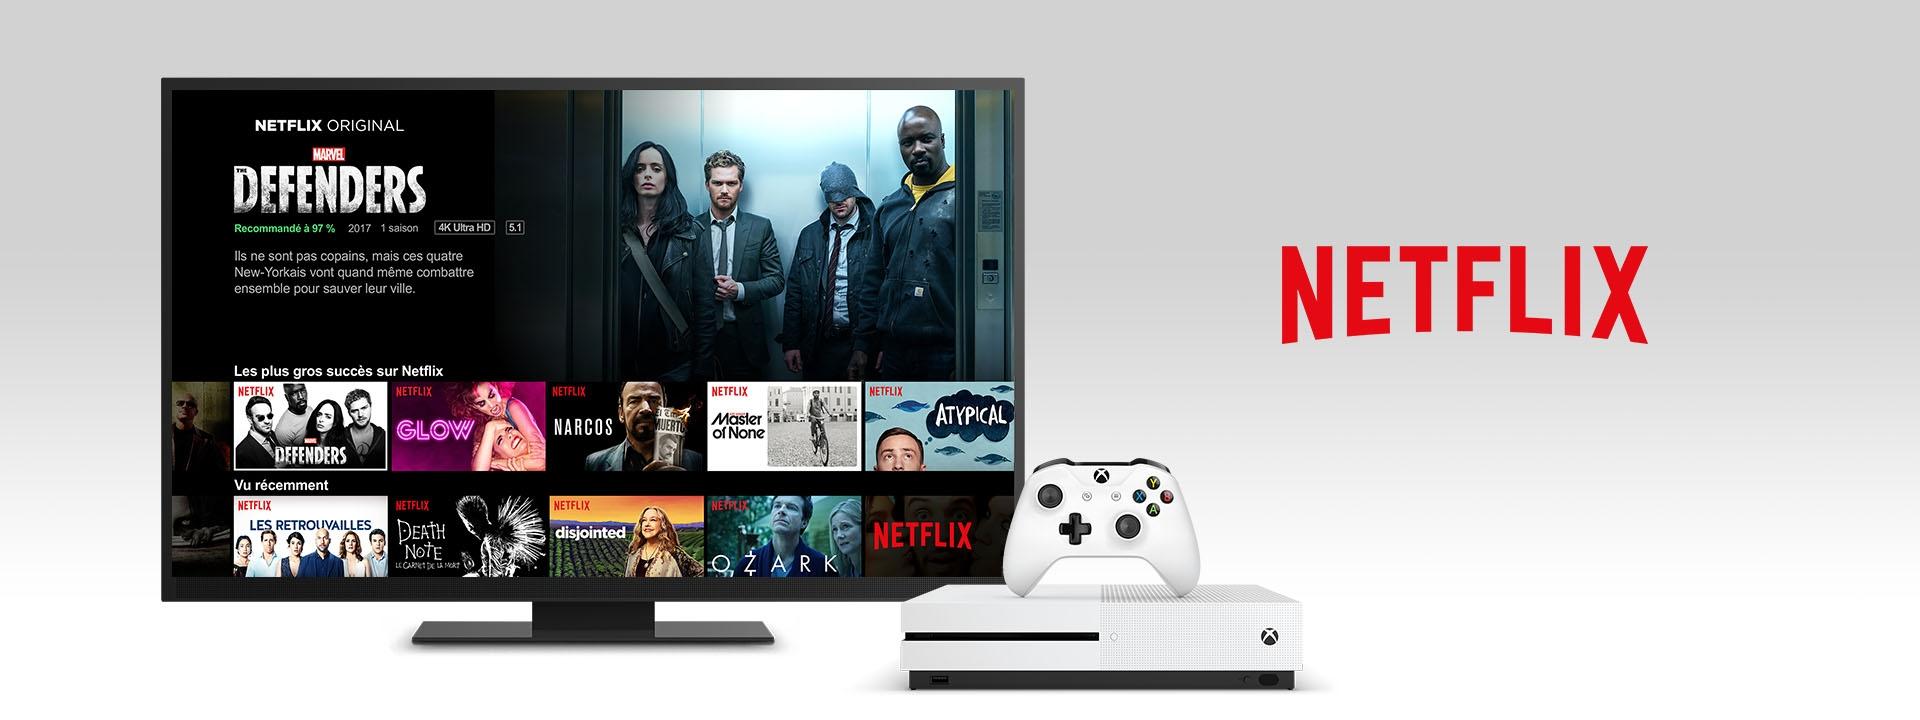 Netflix sur XboxOne